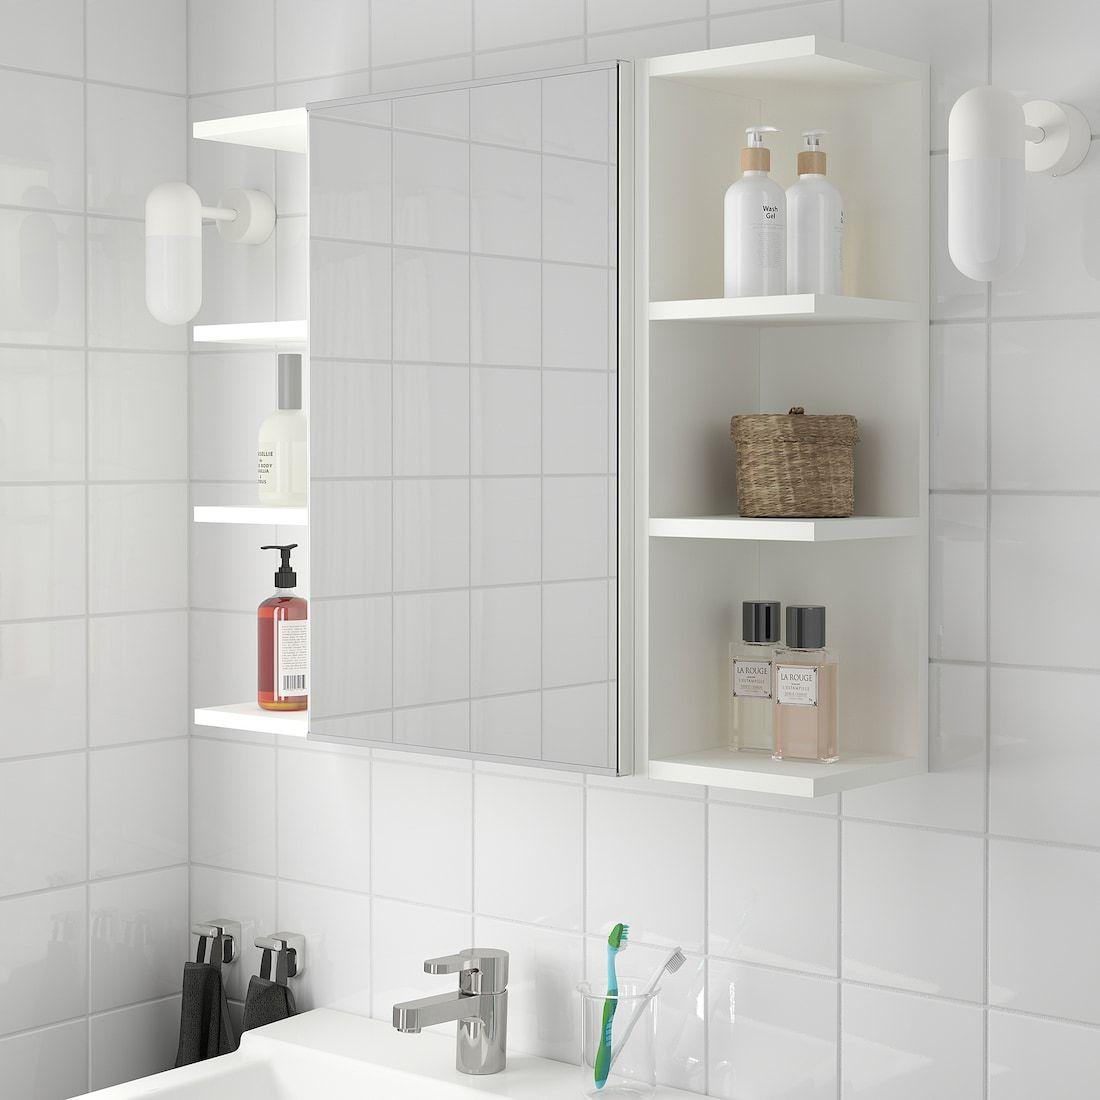 Lillangen Mirror Cabinet 1 Door 2 End Units White 30 3 4x8 1 4x25 1 4 Ikea Mirror Cabinets Bathroom Mirror Cabinet Open Shelving